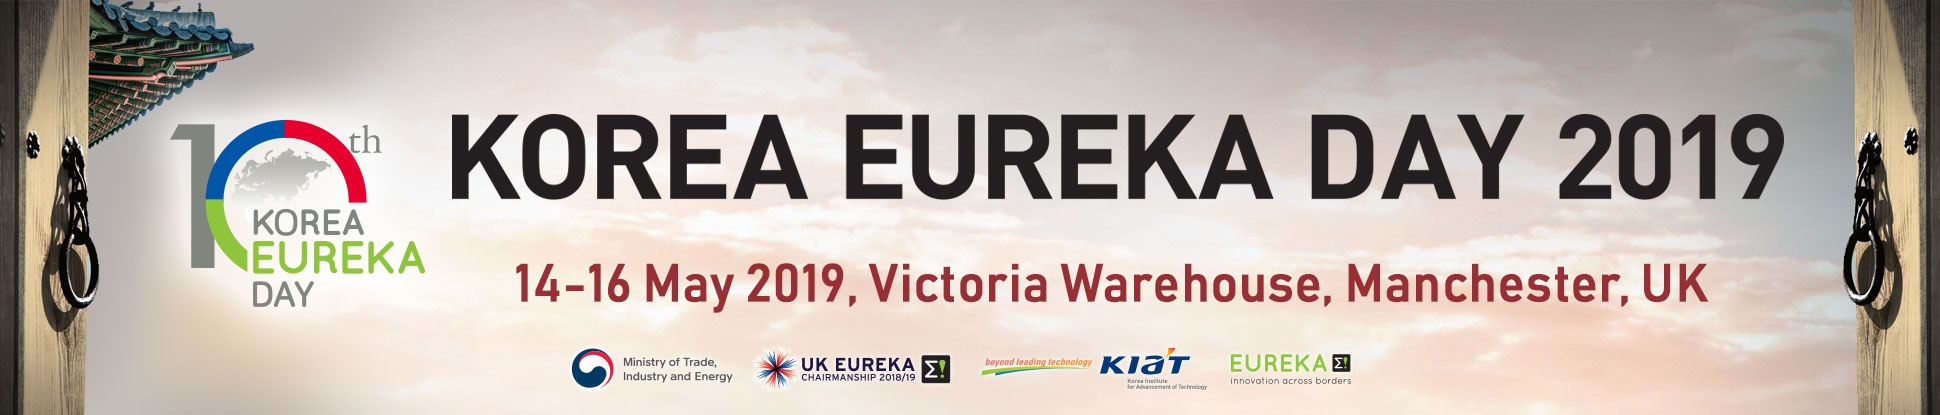 Korea EUREKA Days 2019.jpg